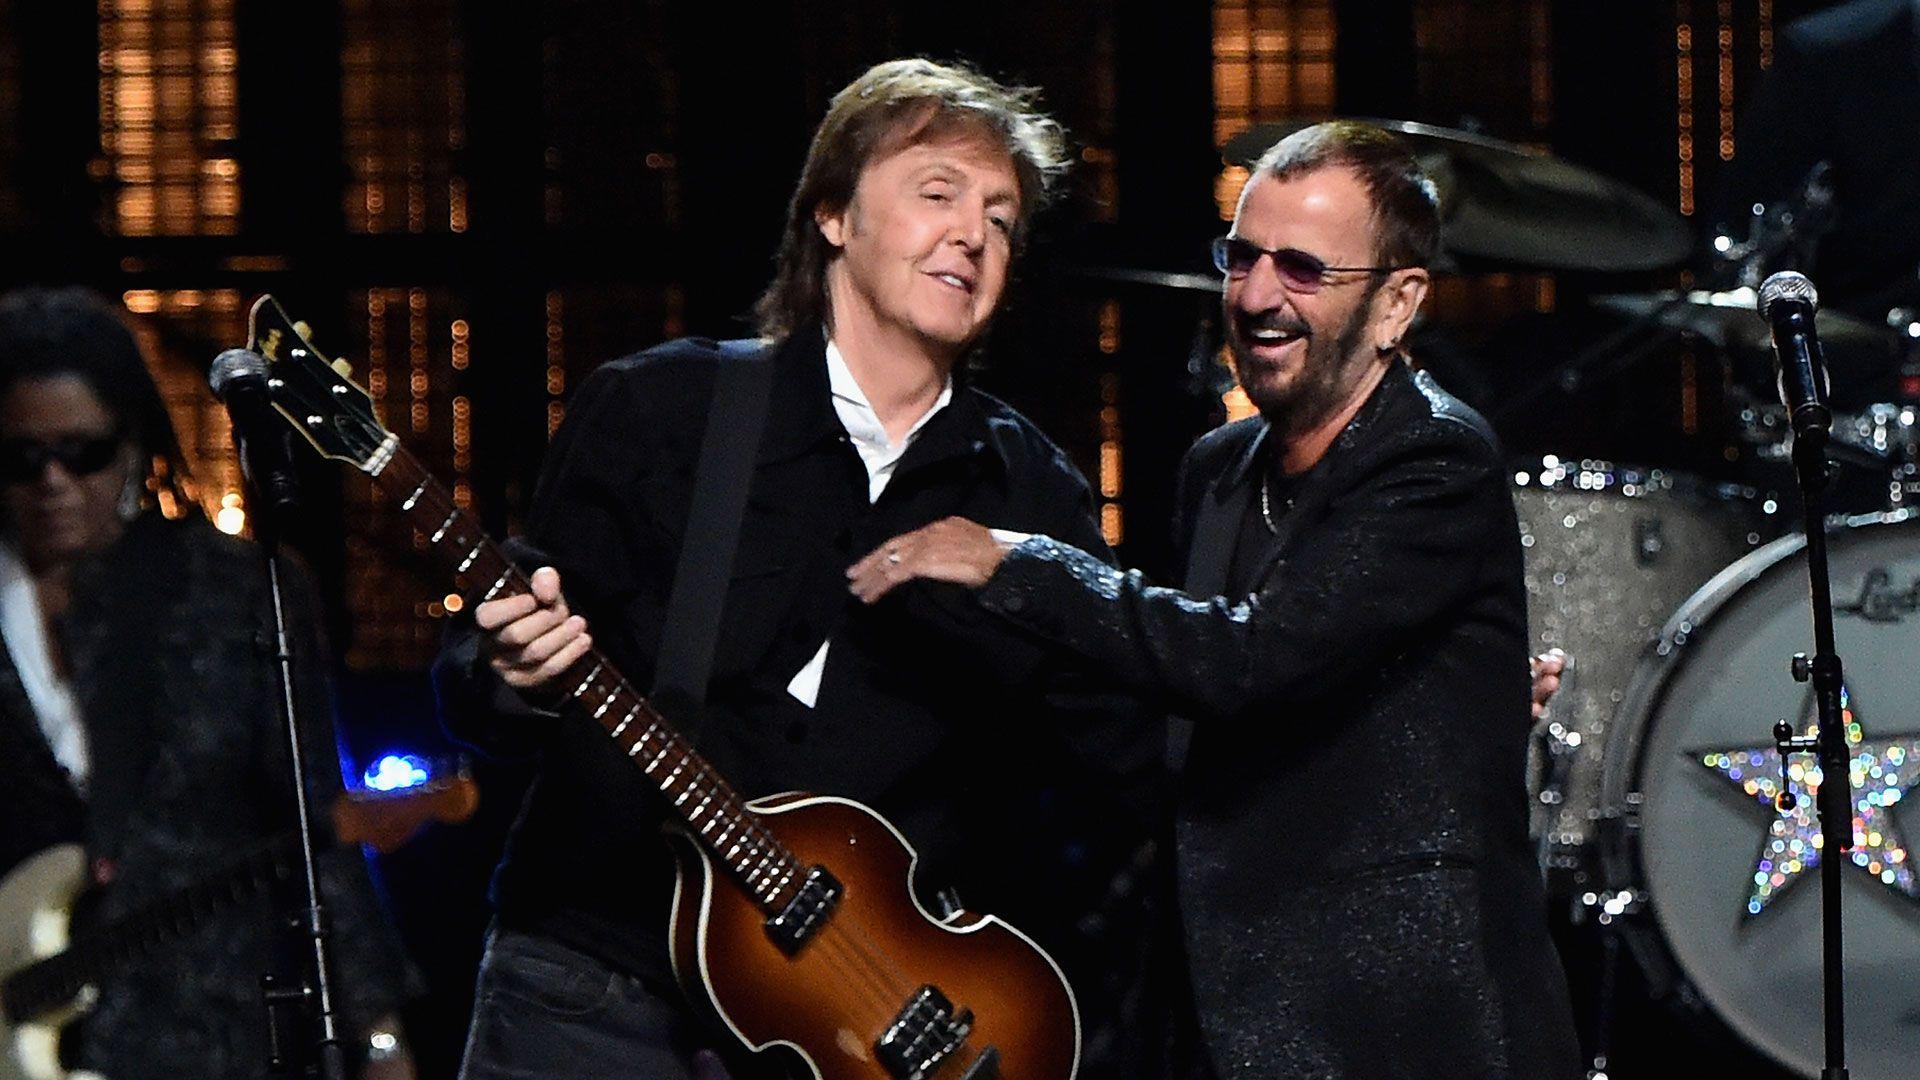 Ringo Starr Y Paul McCartney Vuelven A Grabar Juntos Feb 2017 Infobae